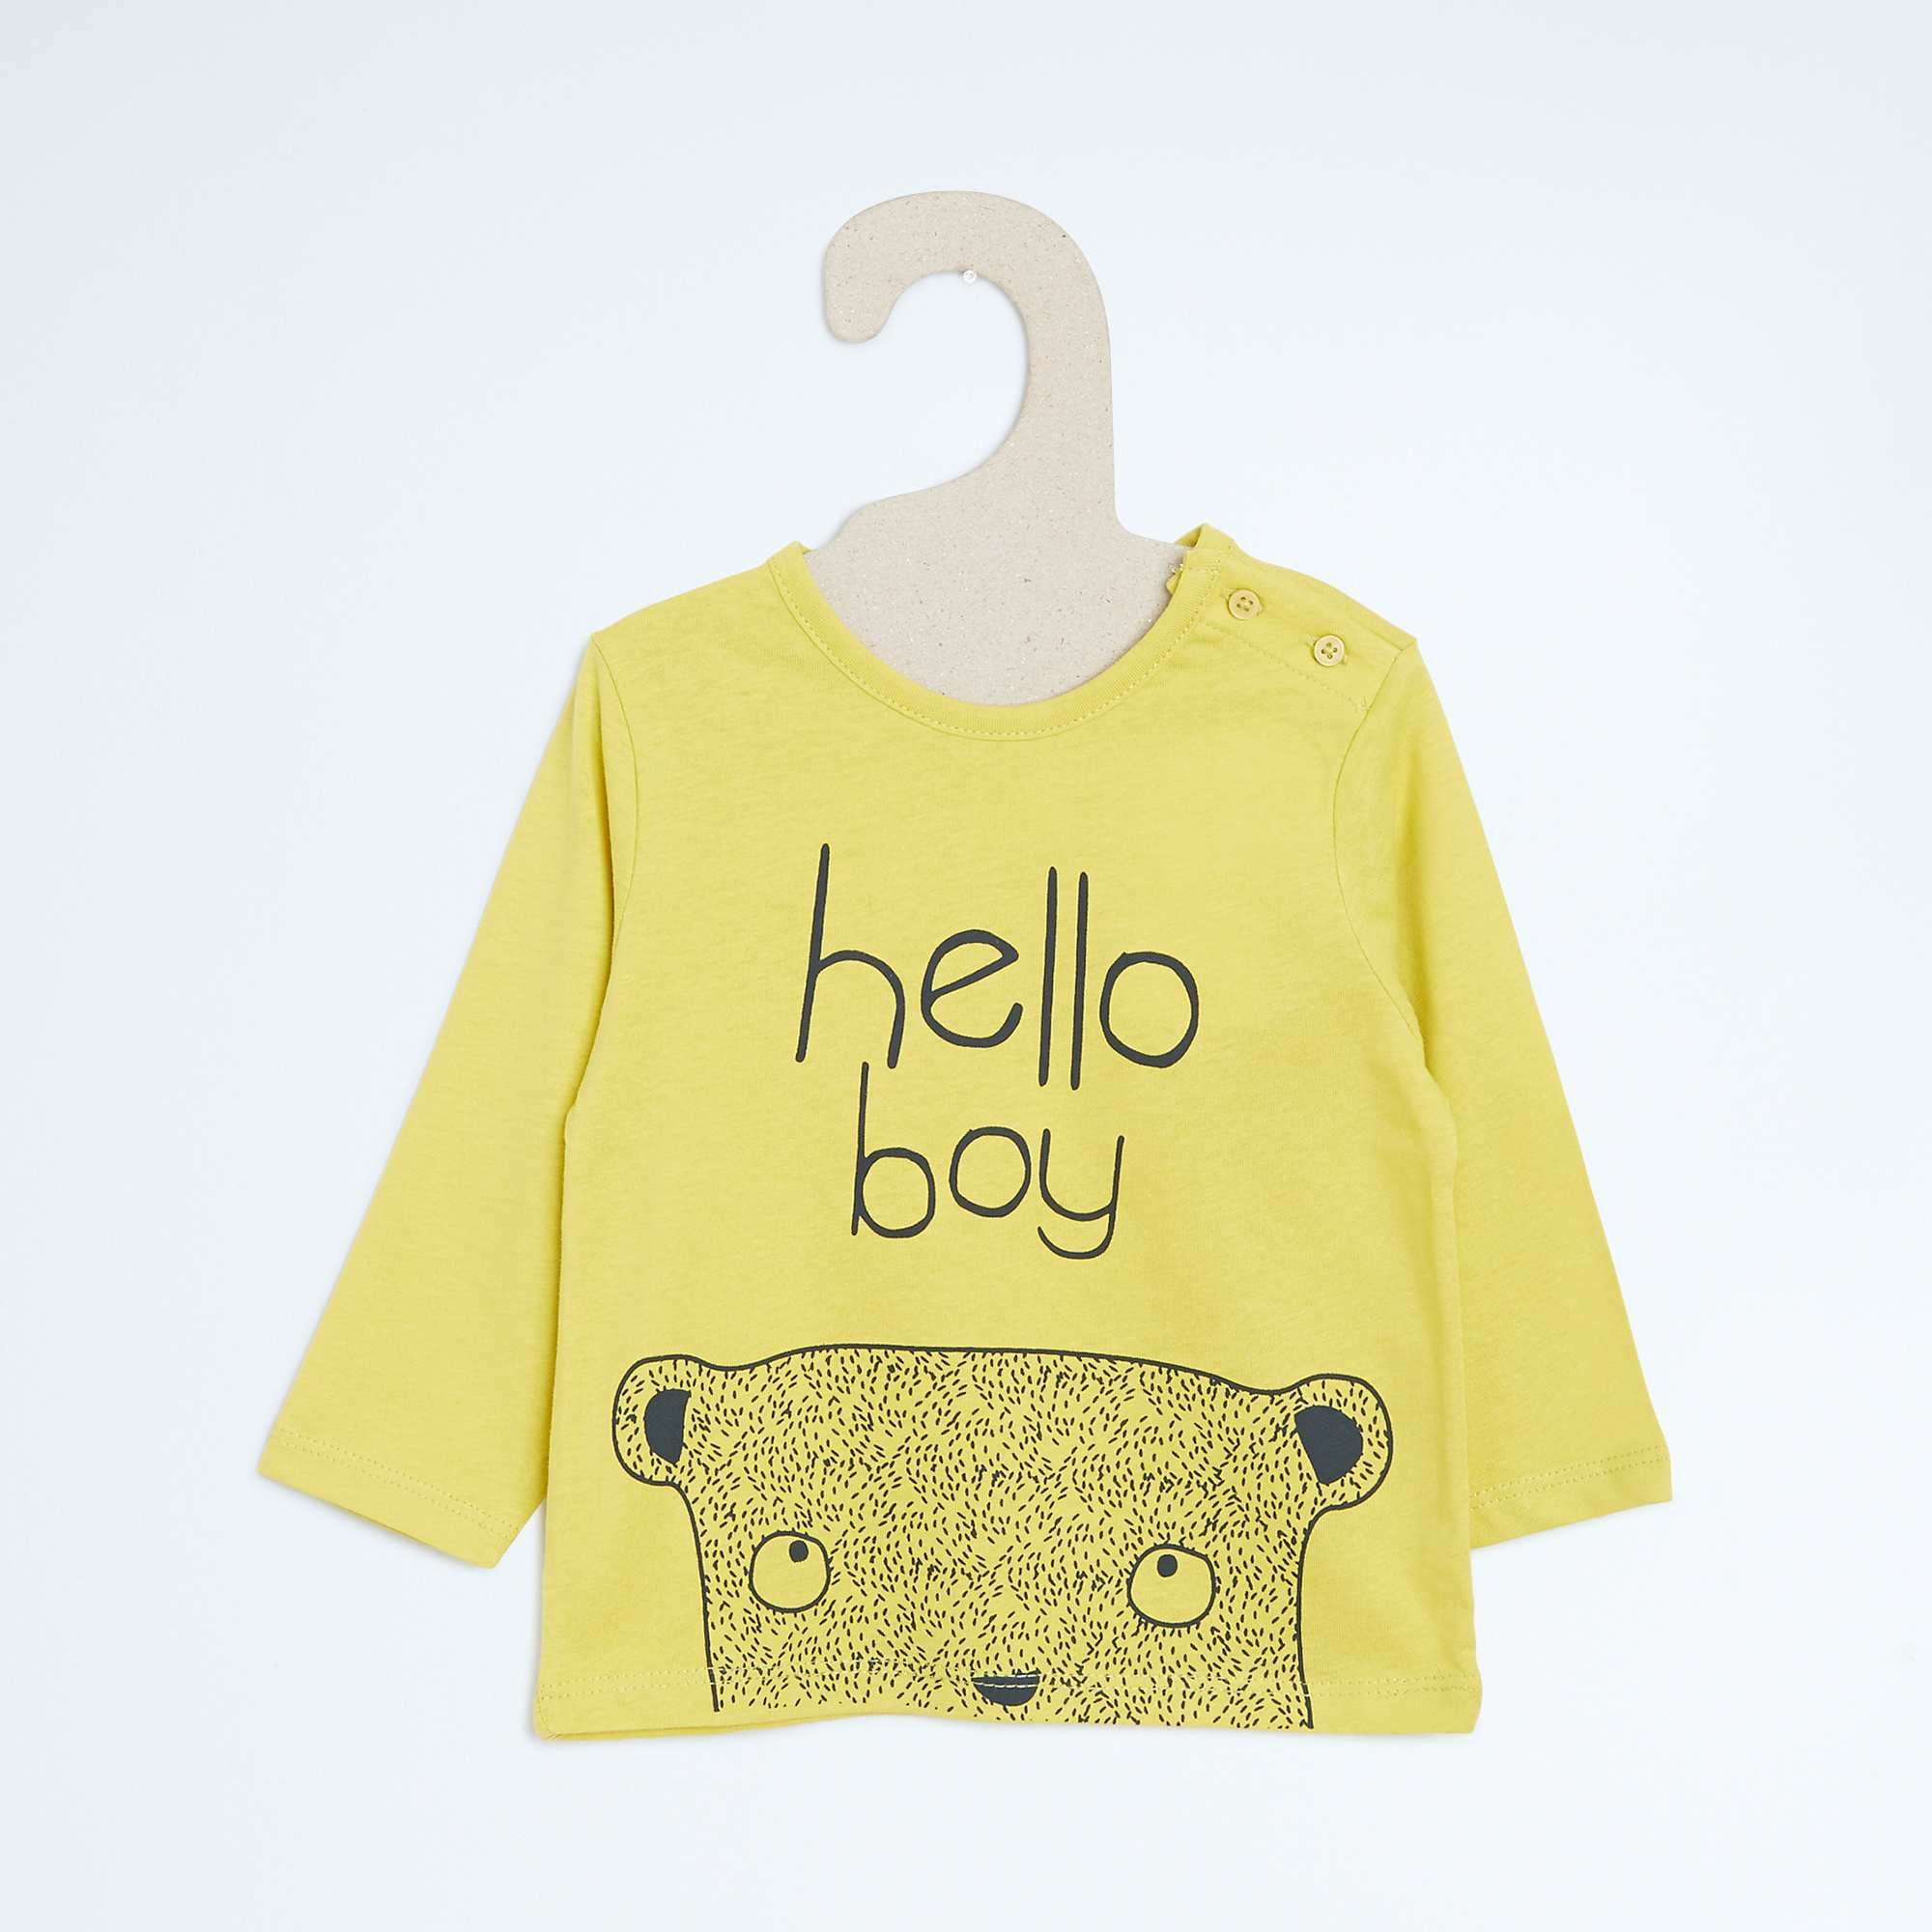 Tee-shirt coton imprimé Bébé garçon - Kiabi - 2 6e23c3a74f3